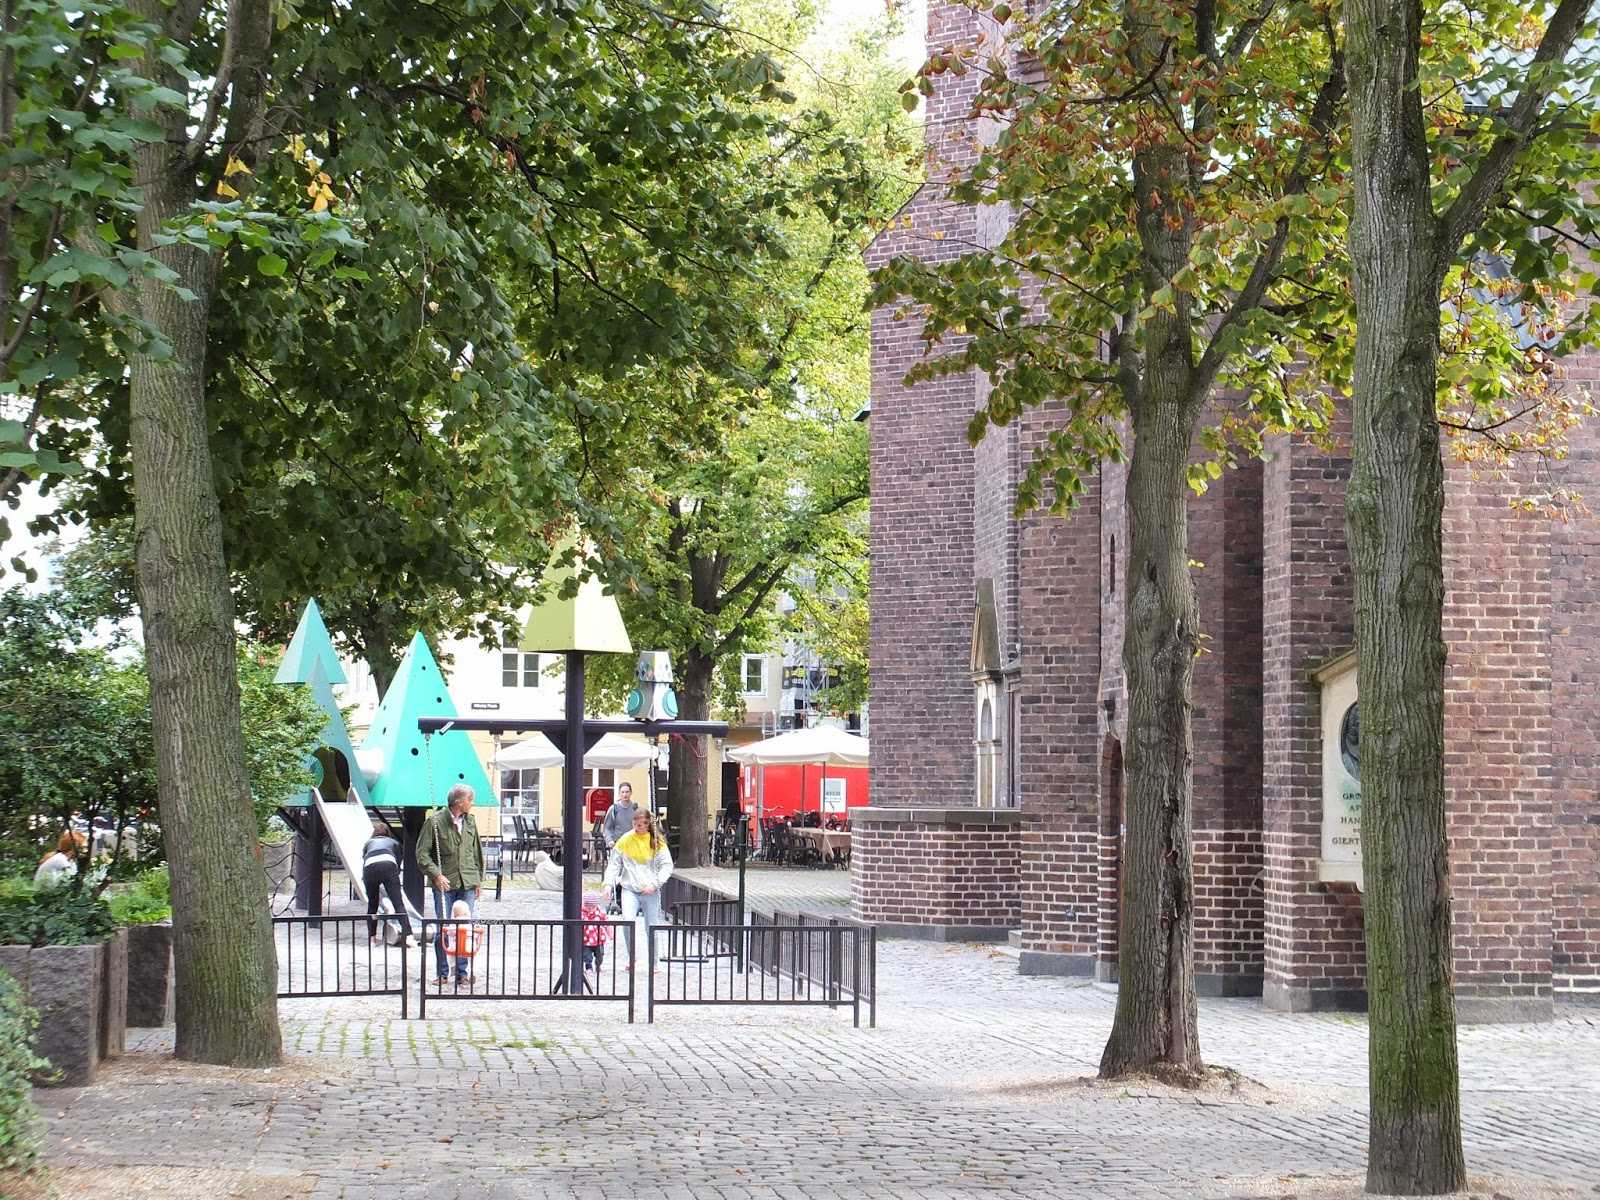 copenhagen-road コペンハーゲンの街中6